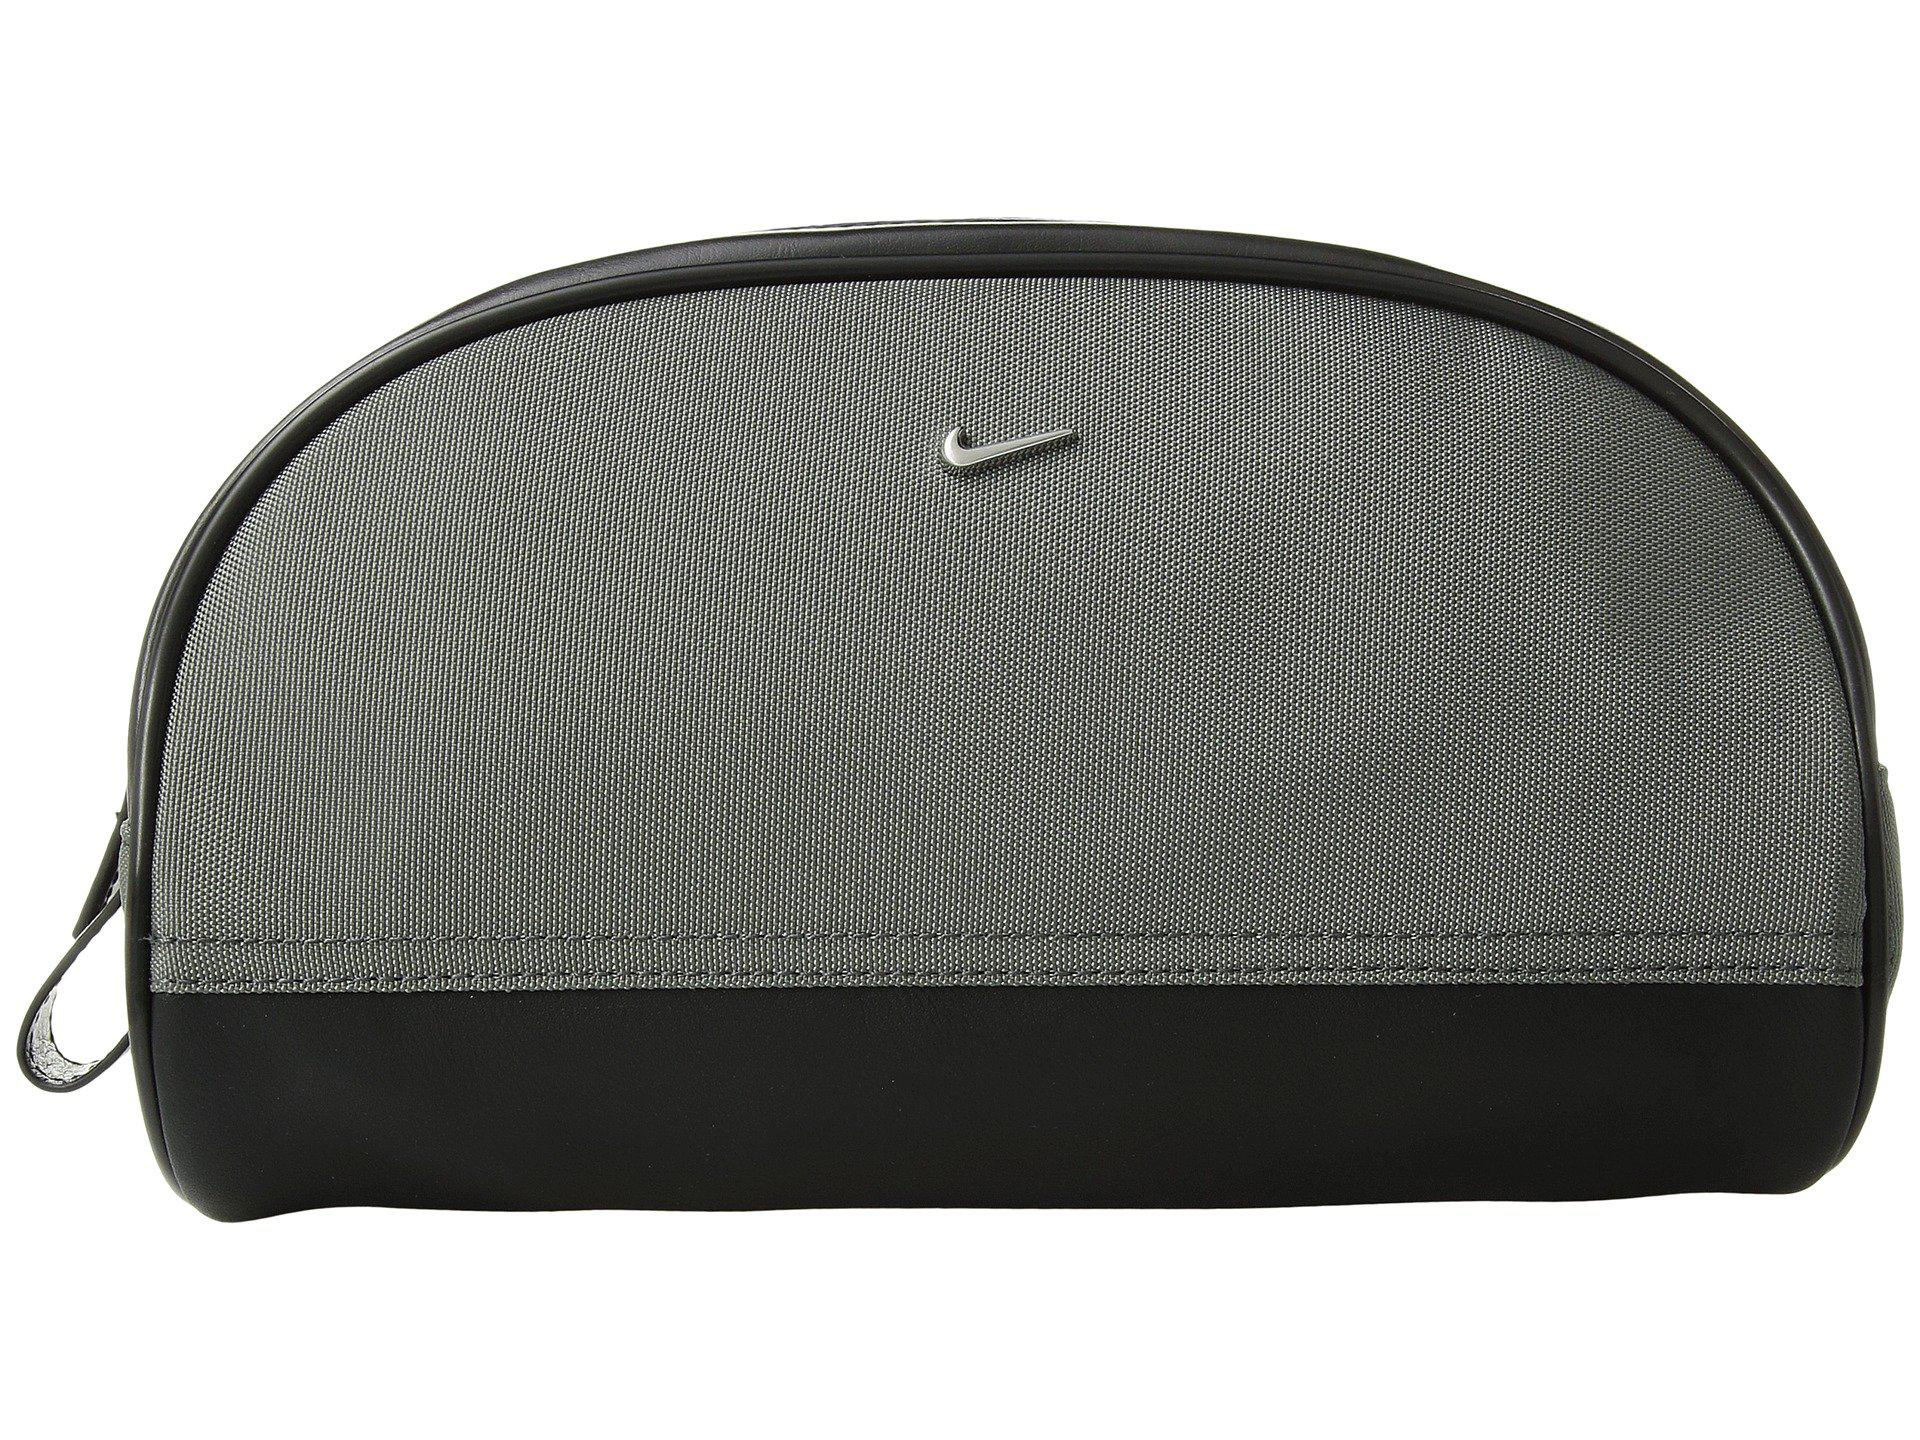 fa6bc6c36f8c Lyst - Nike Ballistic Nylon Travel Kit (grey) Travel Pouch in Gray